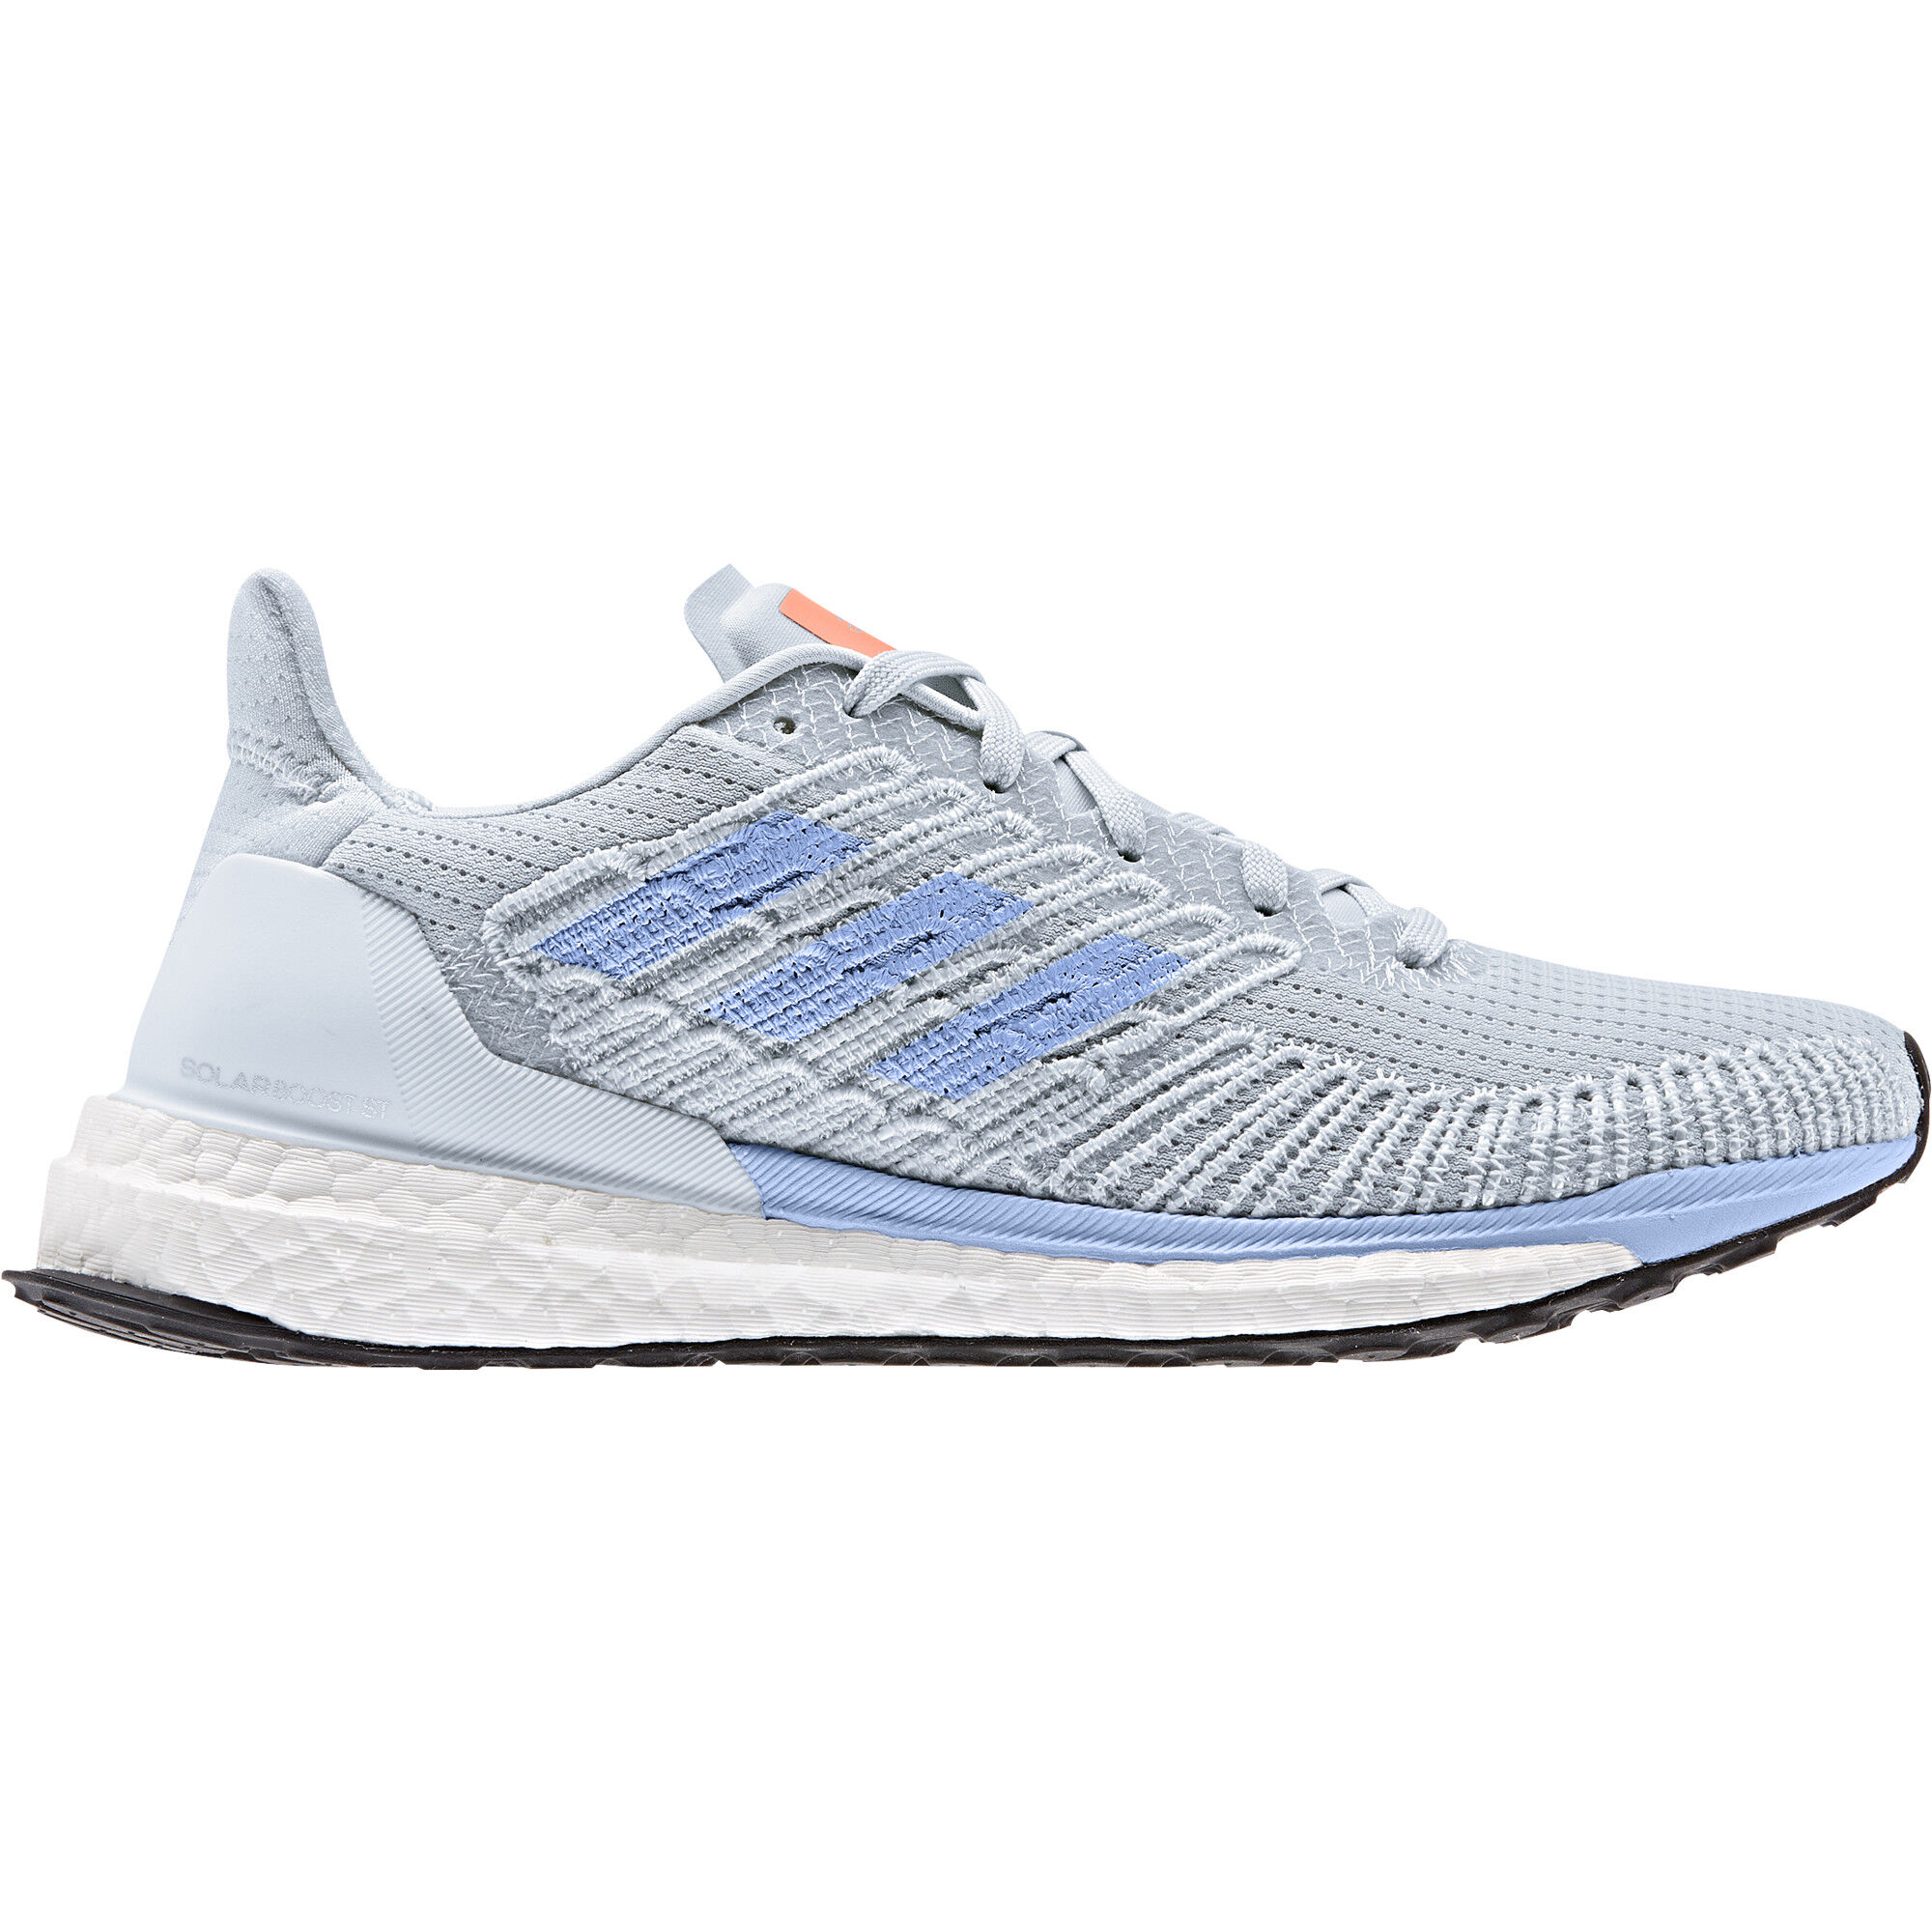 adidas Adizero Boston 8 Low Cut Schuhe Damen grey twofootwear whitehi res coral